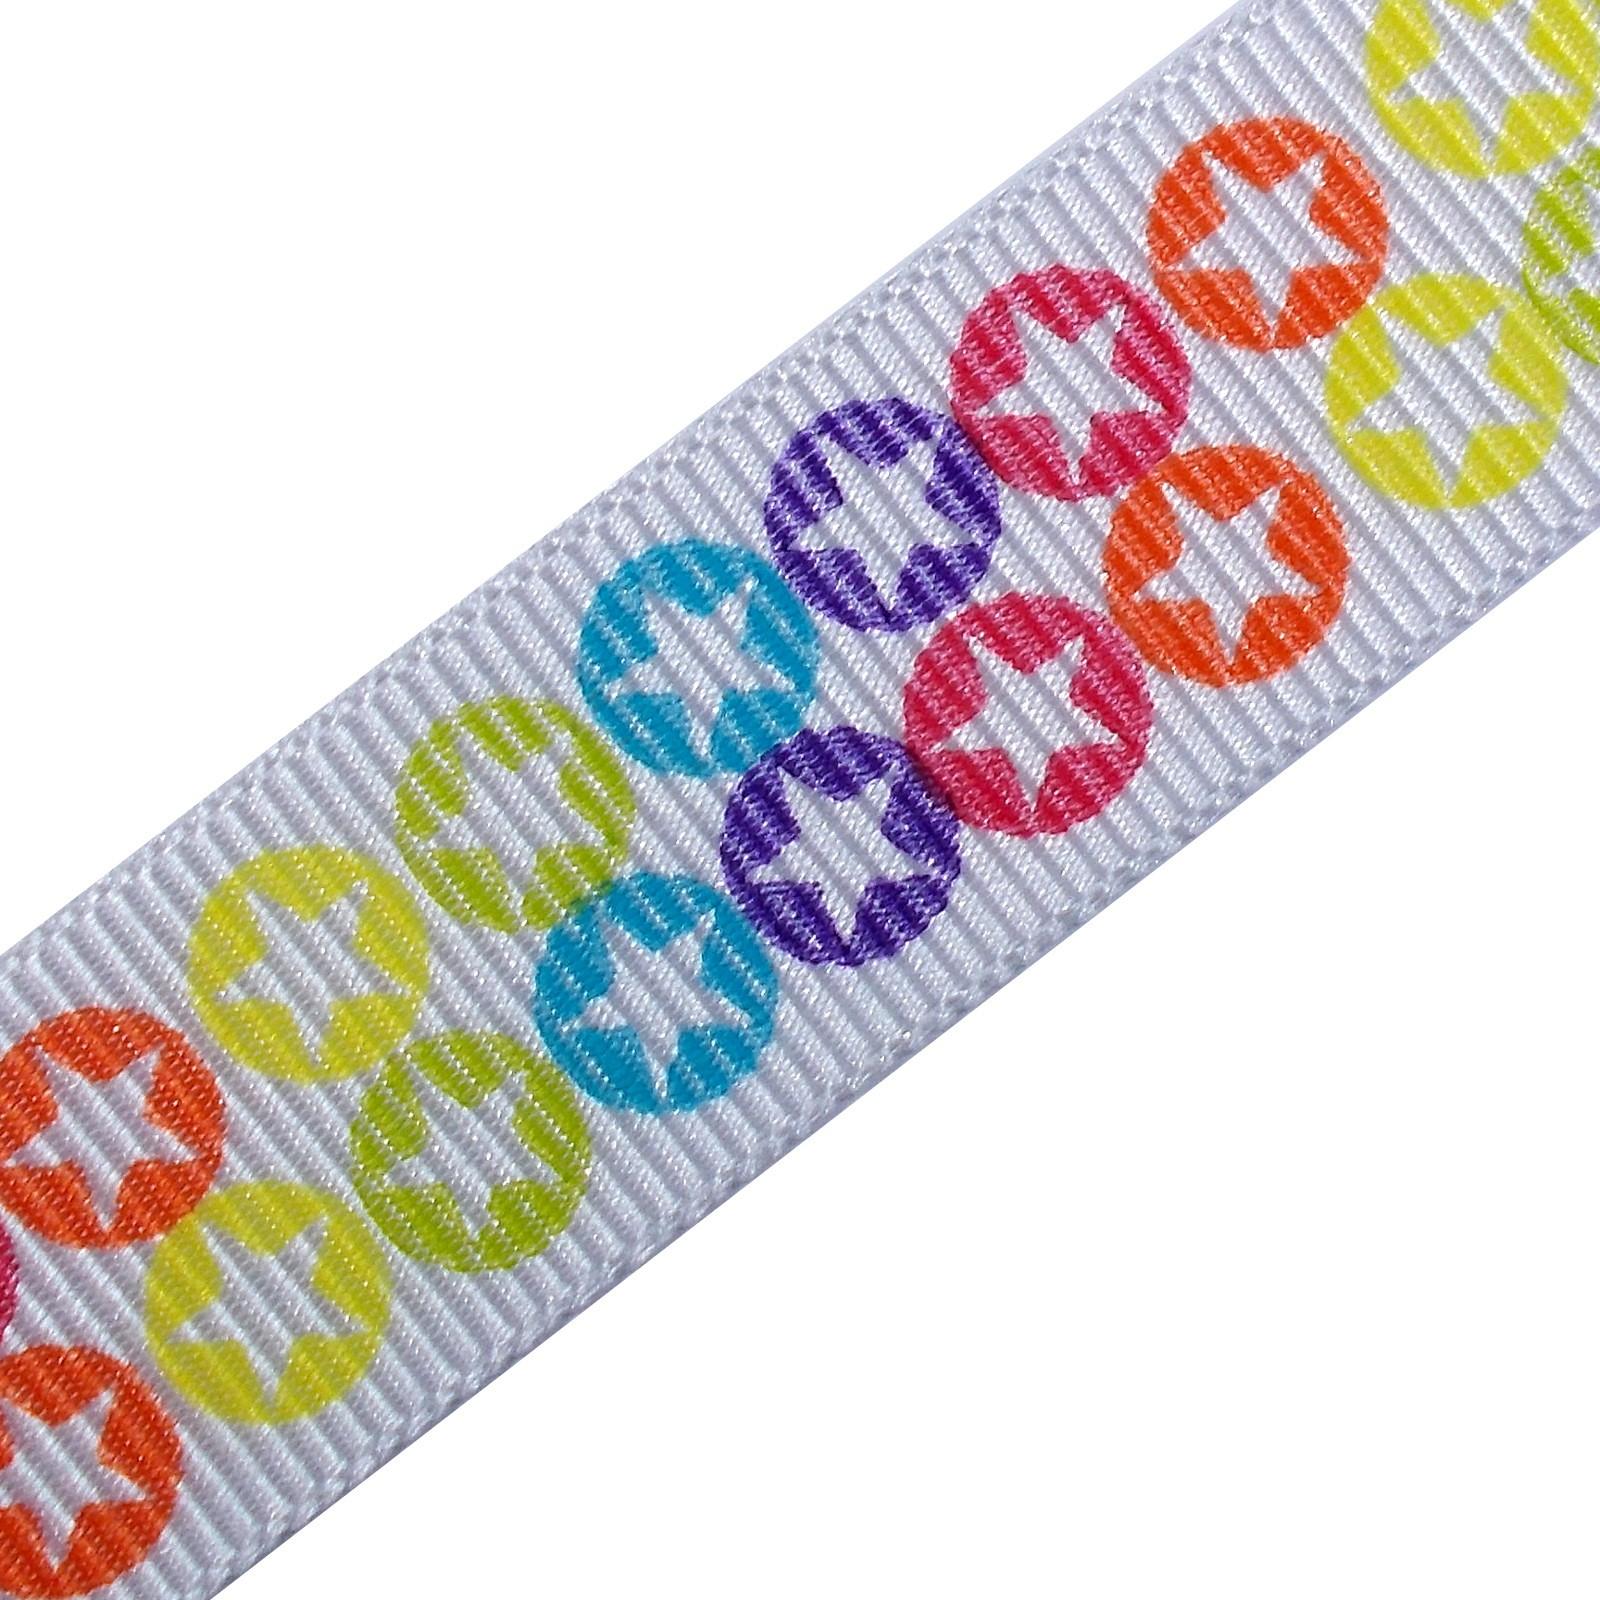 Berisfords Bright Rainbow Grosgrain Ribbon 16mm wide Stars 2 metre length